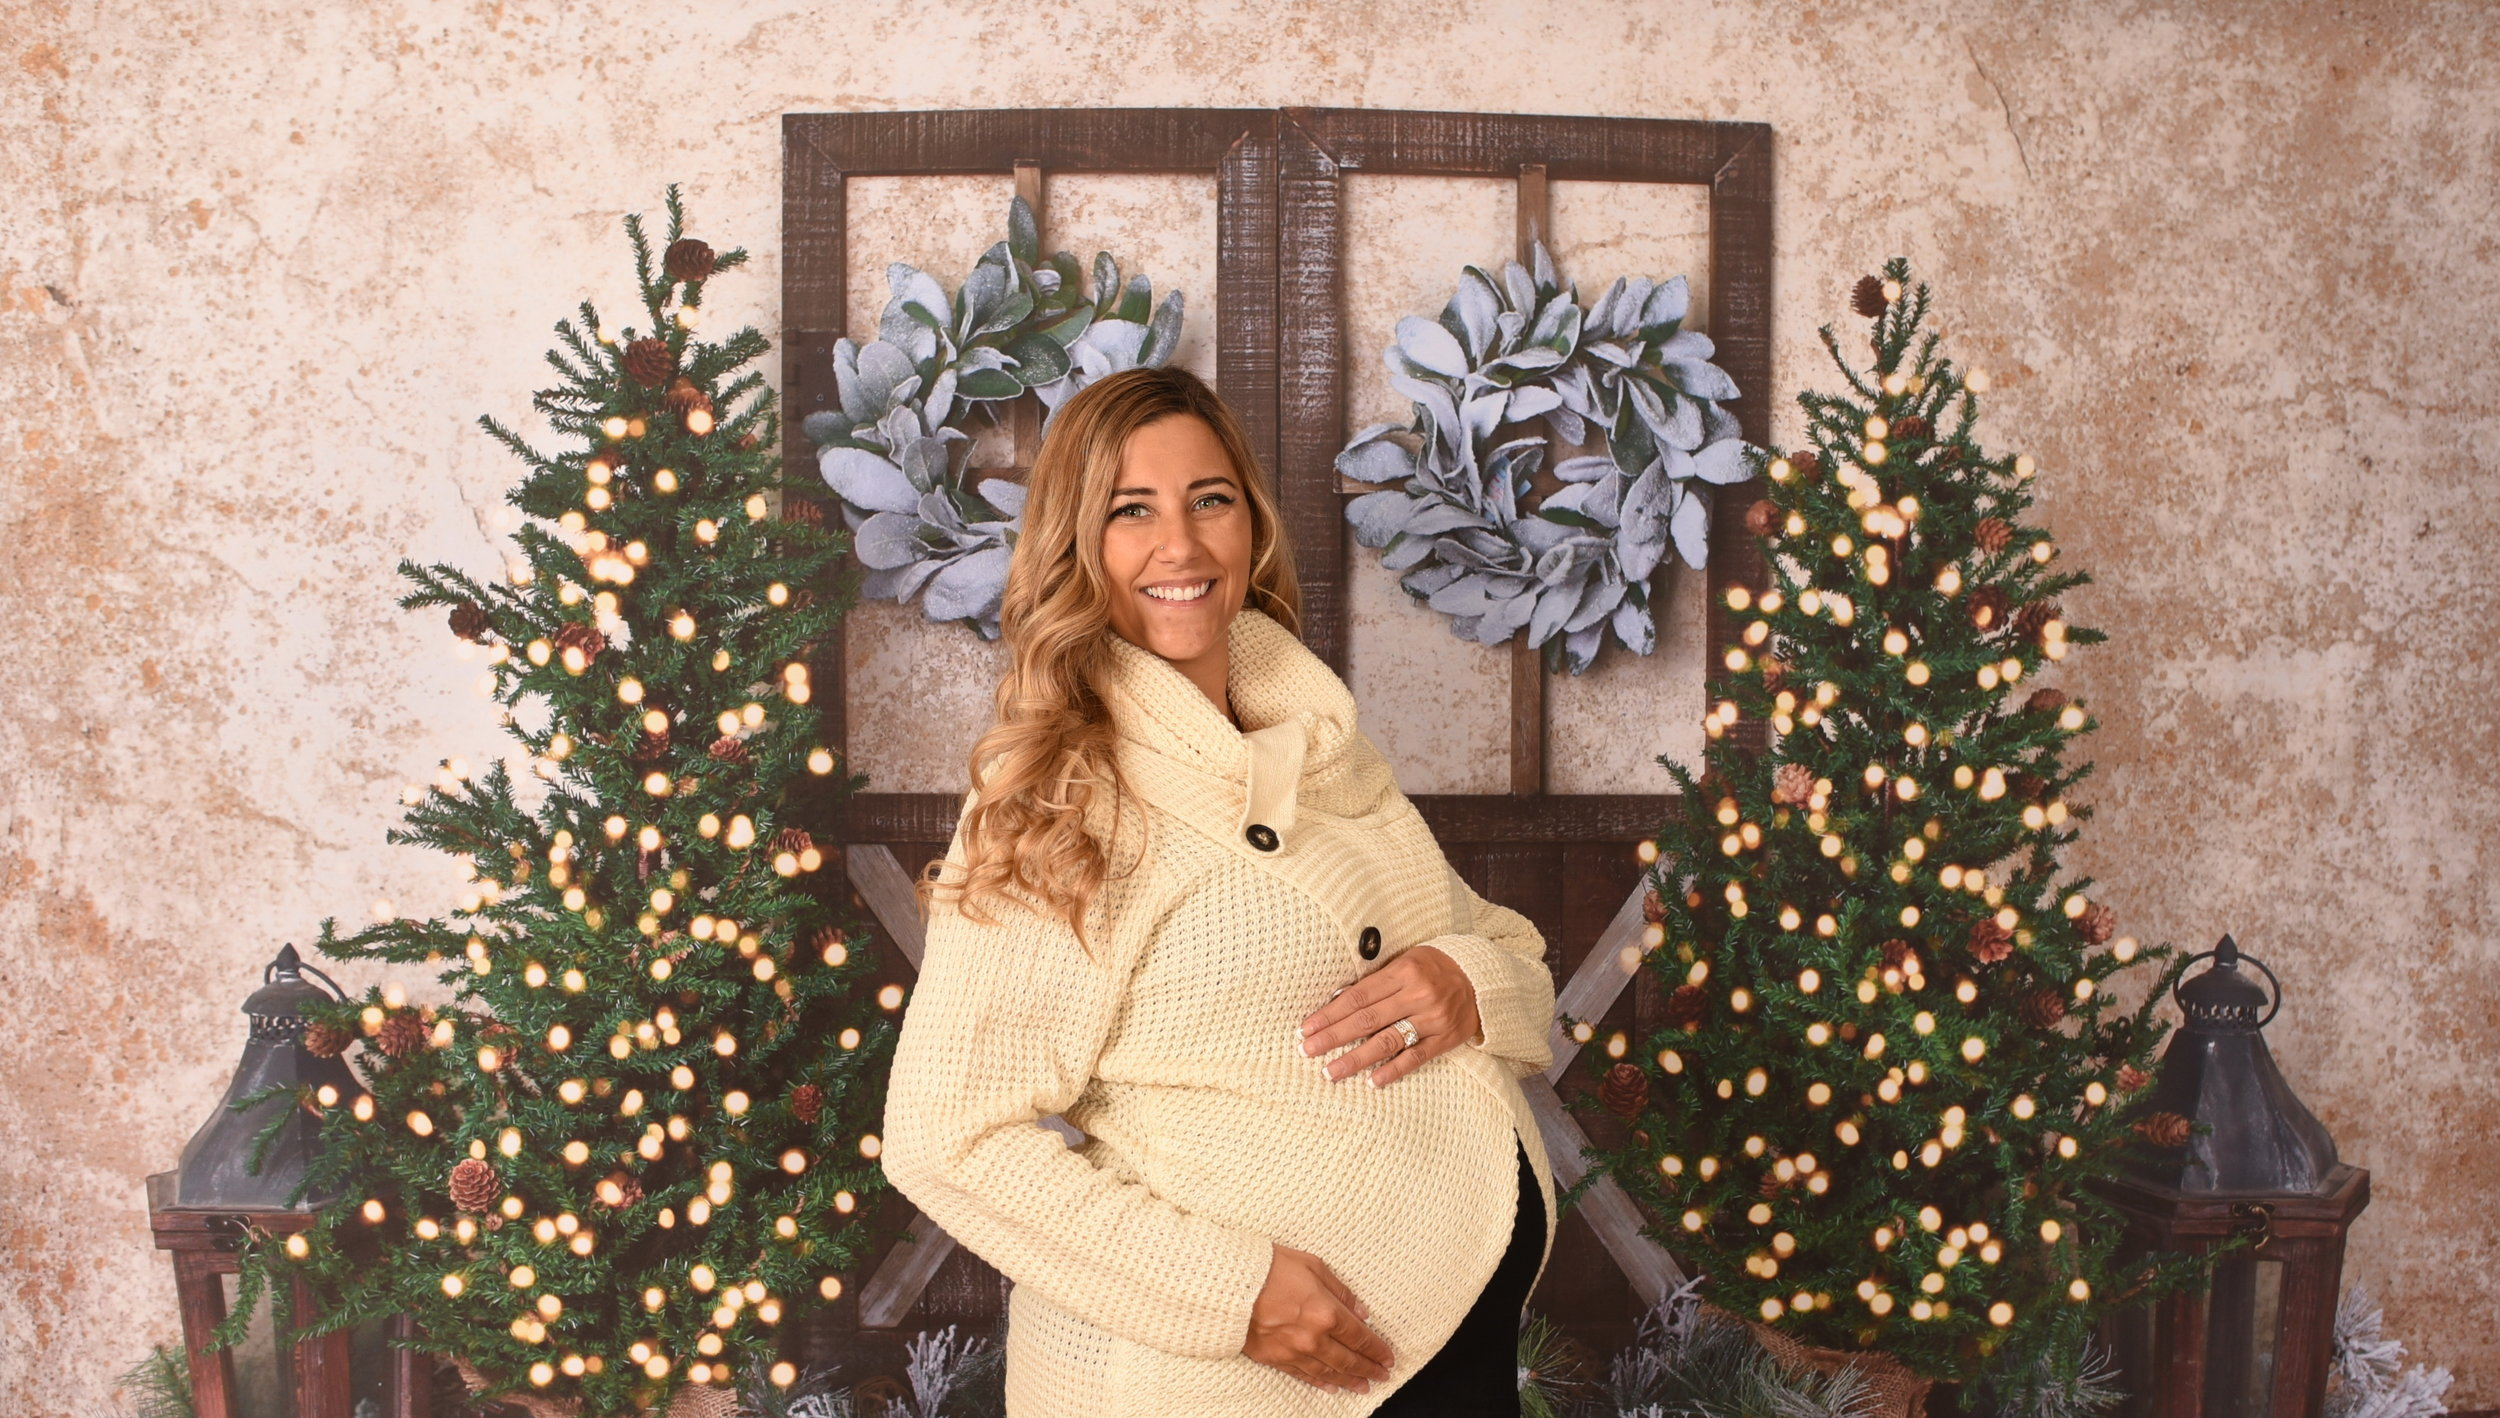 Neutral Christmas Backdrop